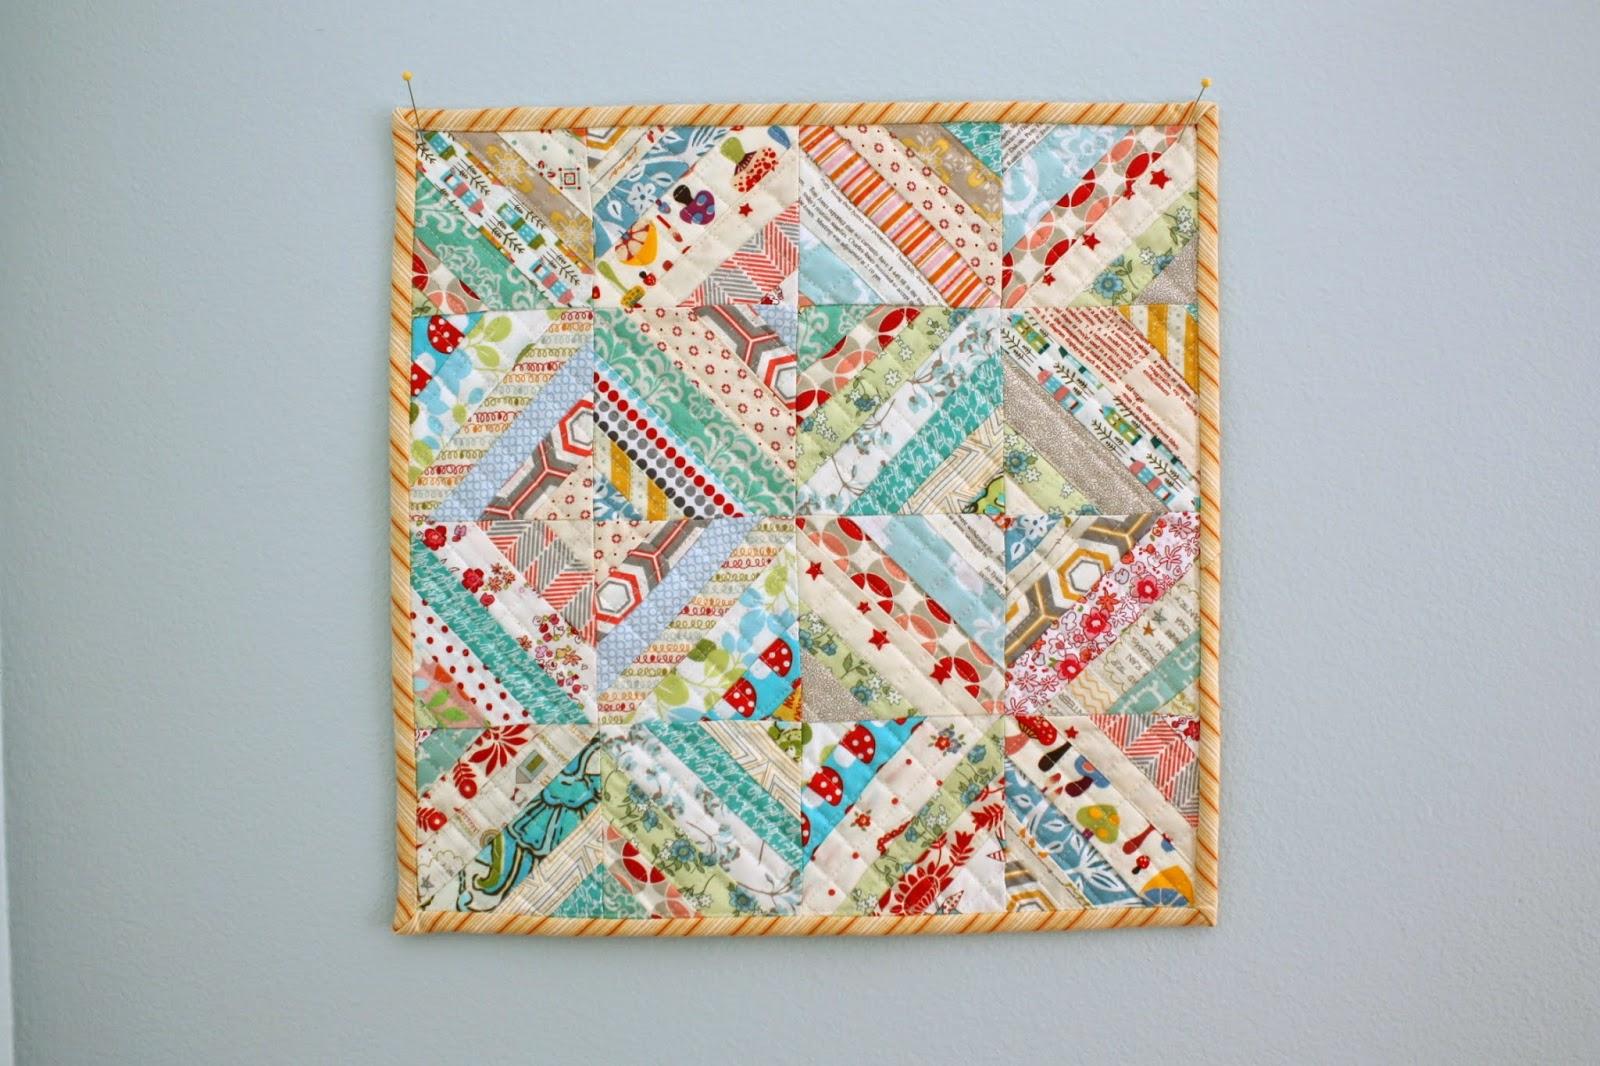 Easy Scrap Quilt Block Patterns : Easy Scrap fabric quilt block - Diary of a Quilter - a quilt blog